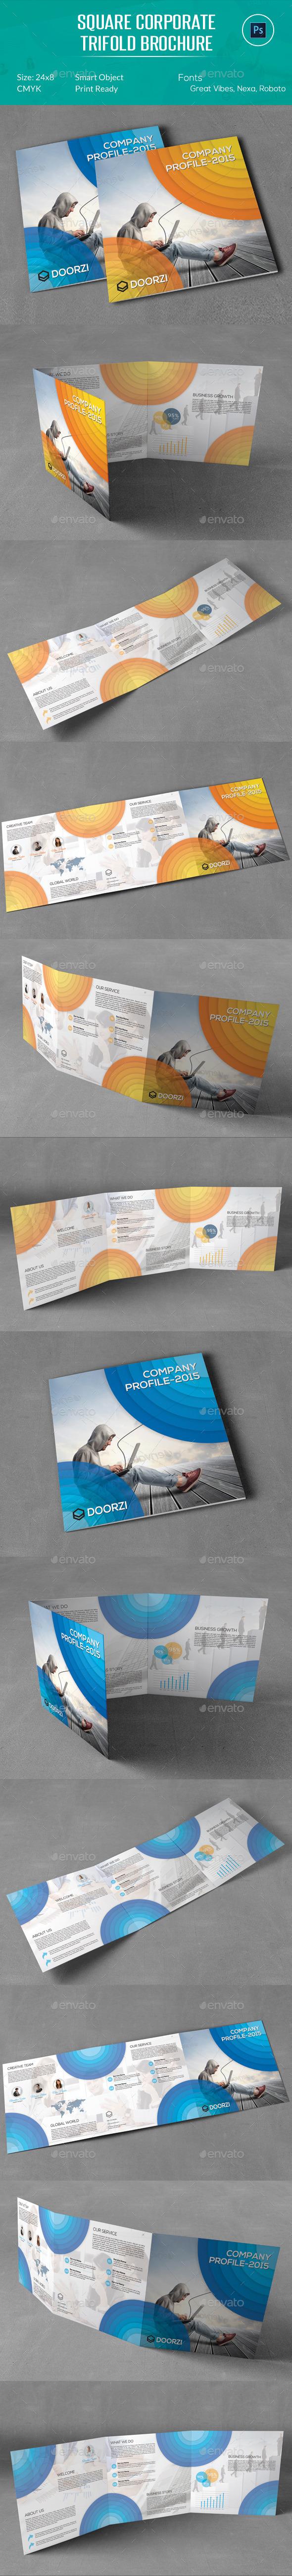 Company Profile Square Trifold Brochure - Corporate Brochures